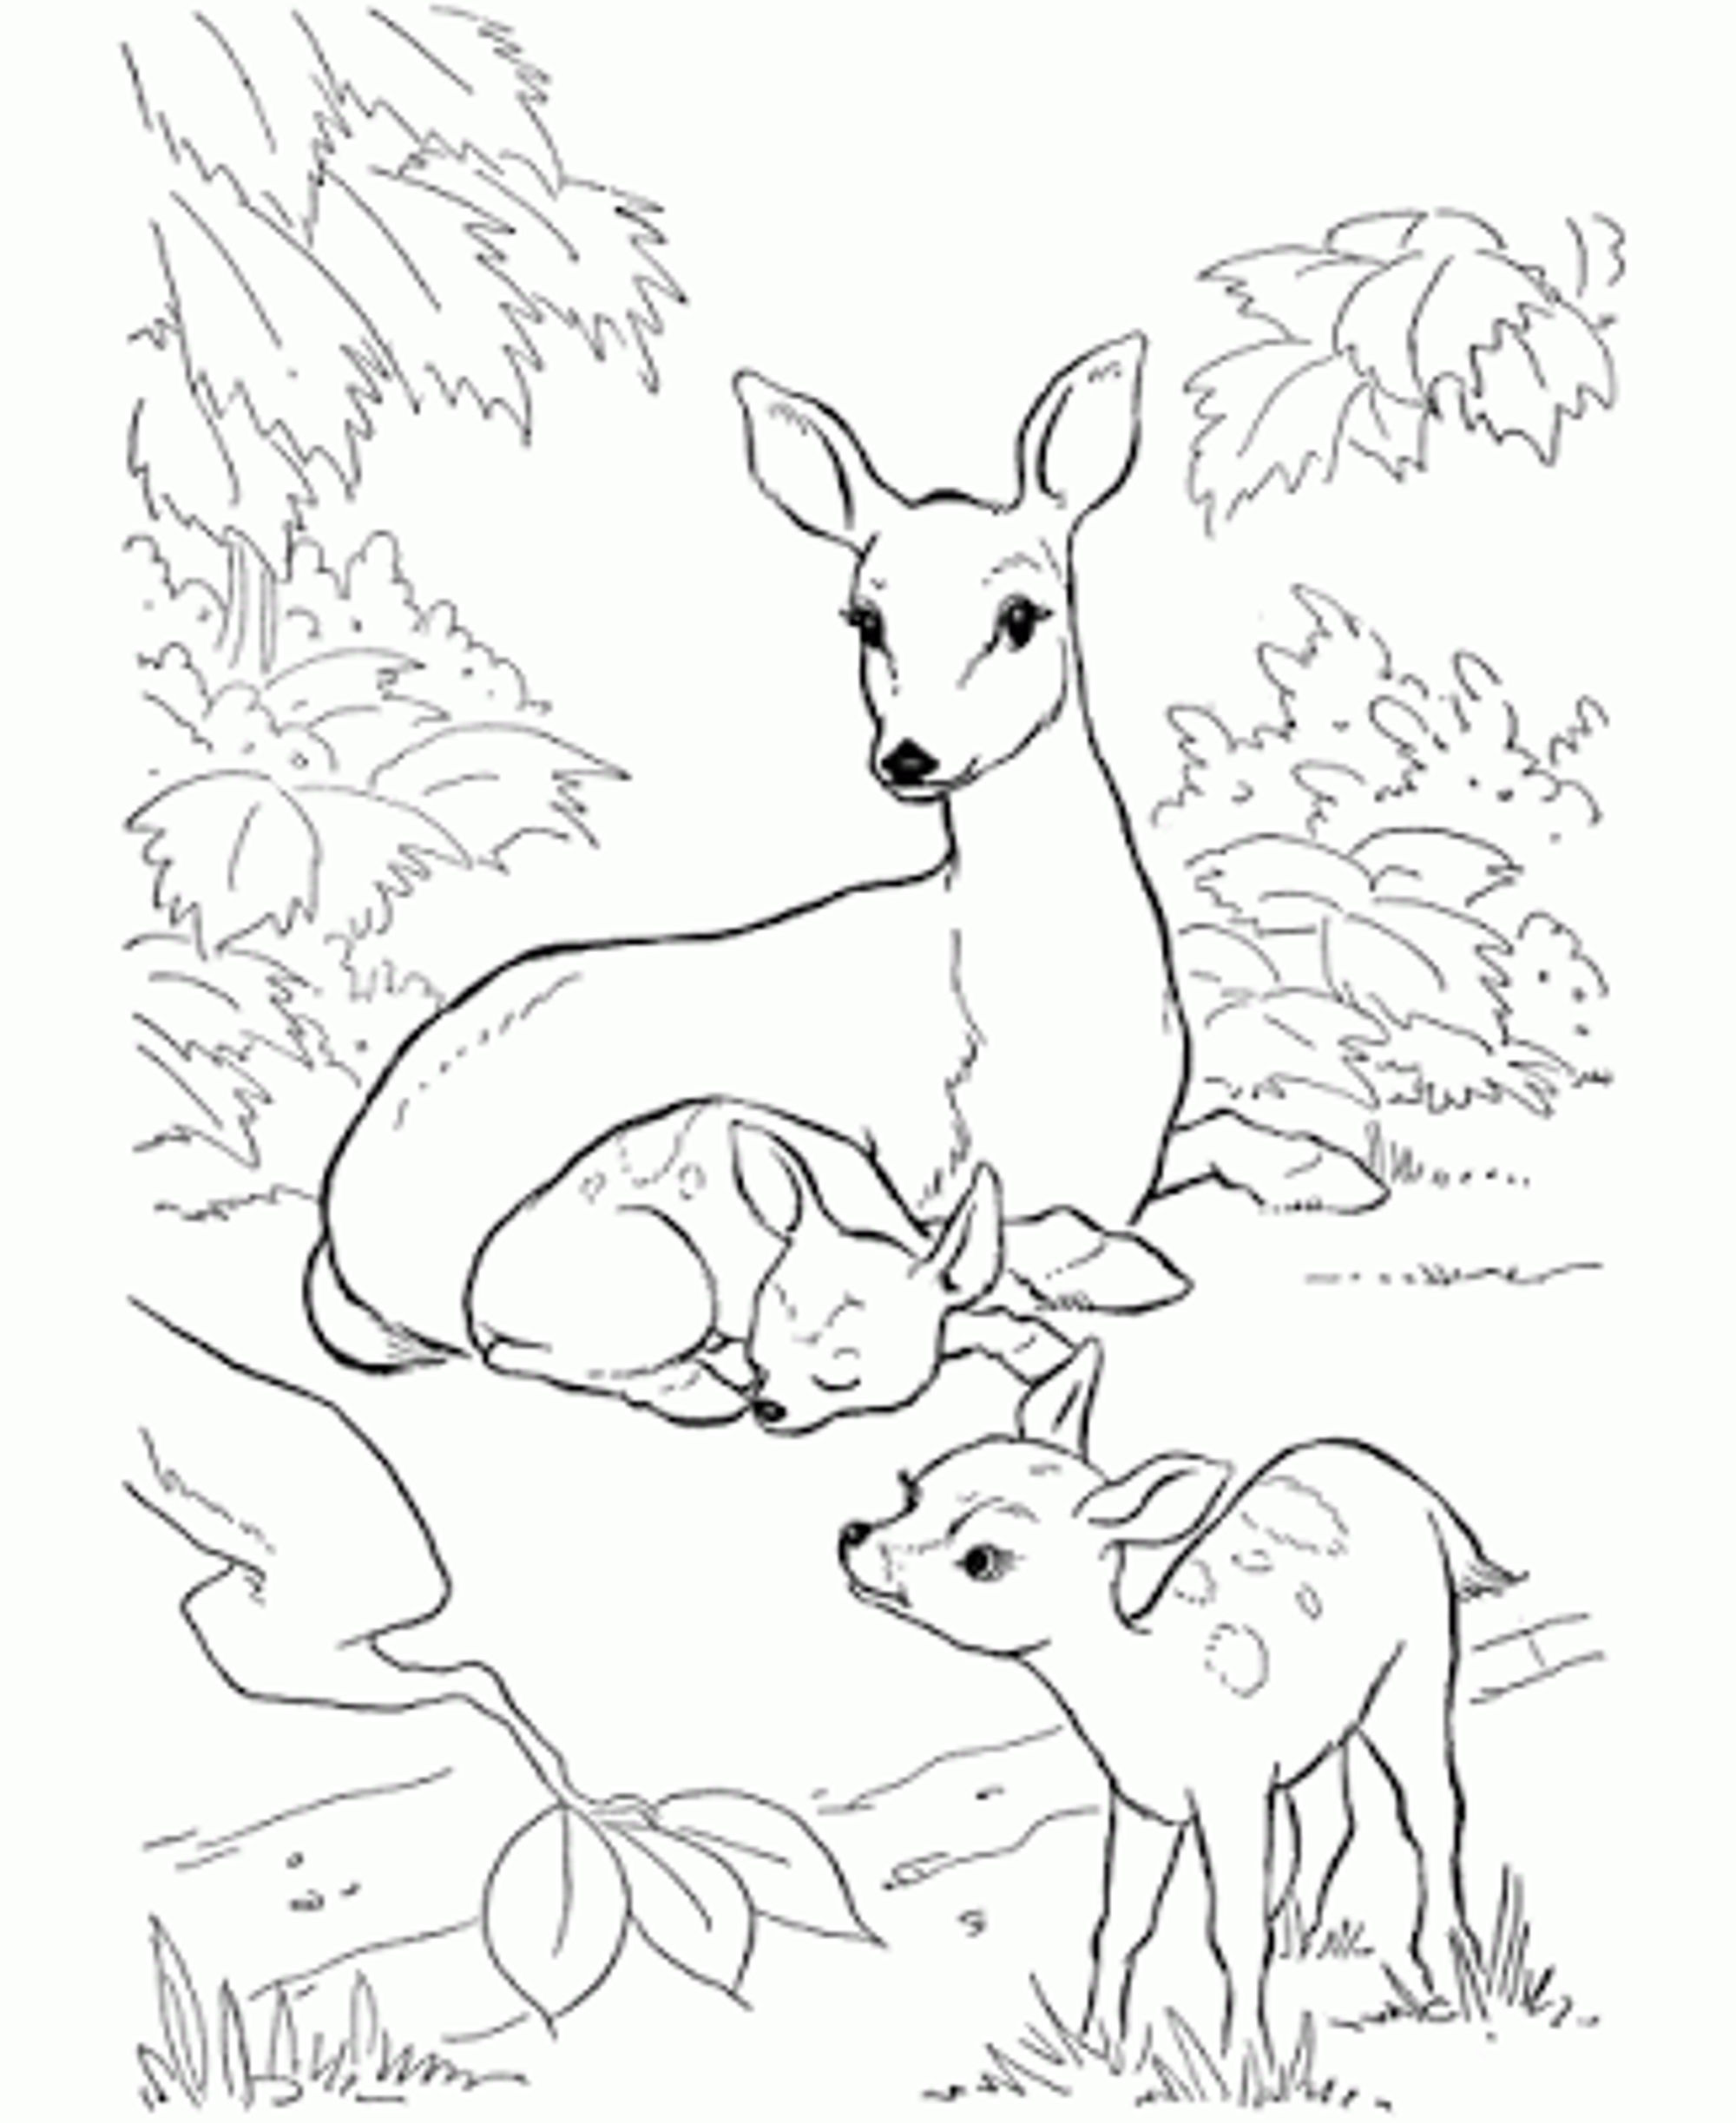 Whitetail Deer Drawing At Getdrawings